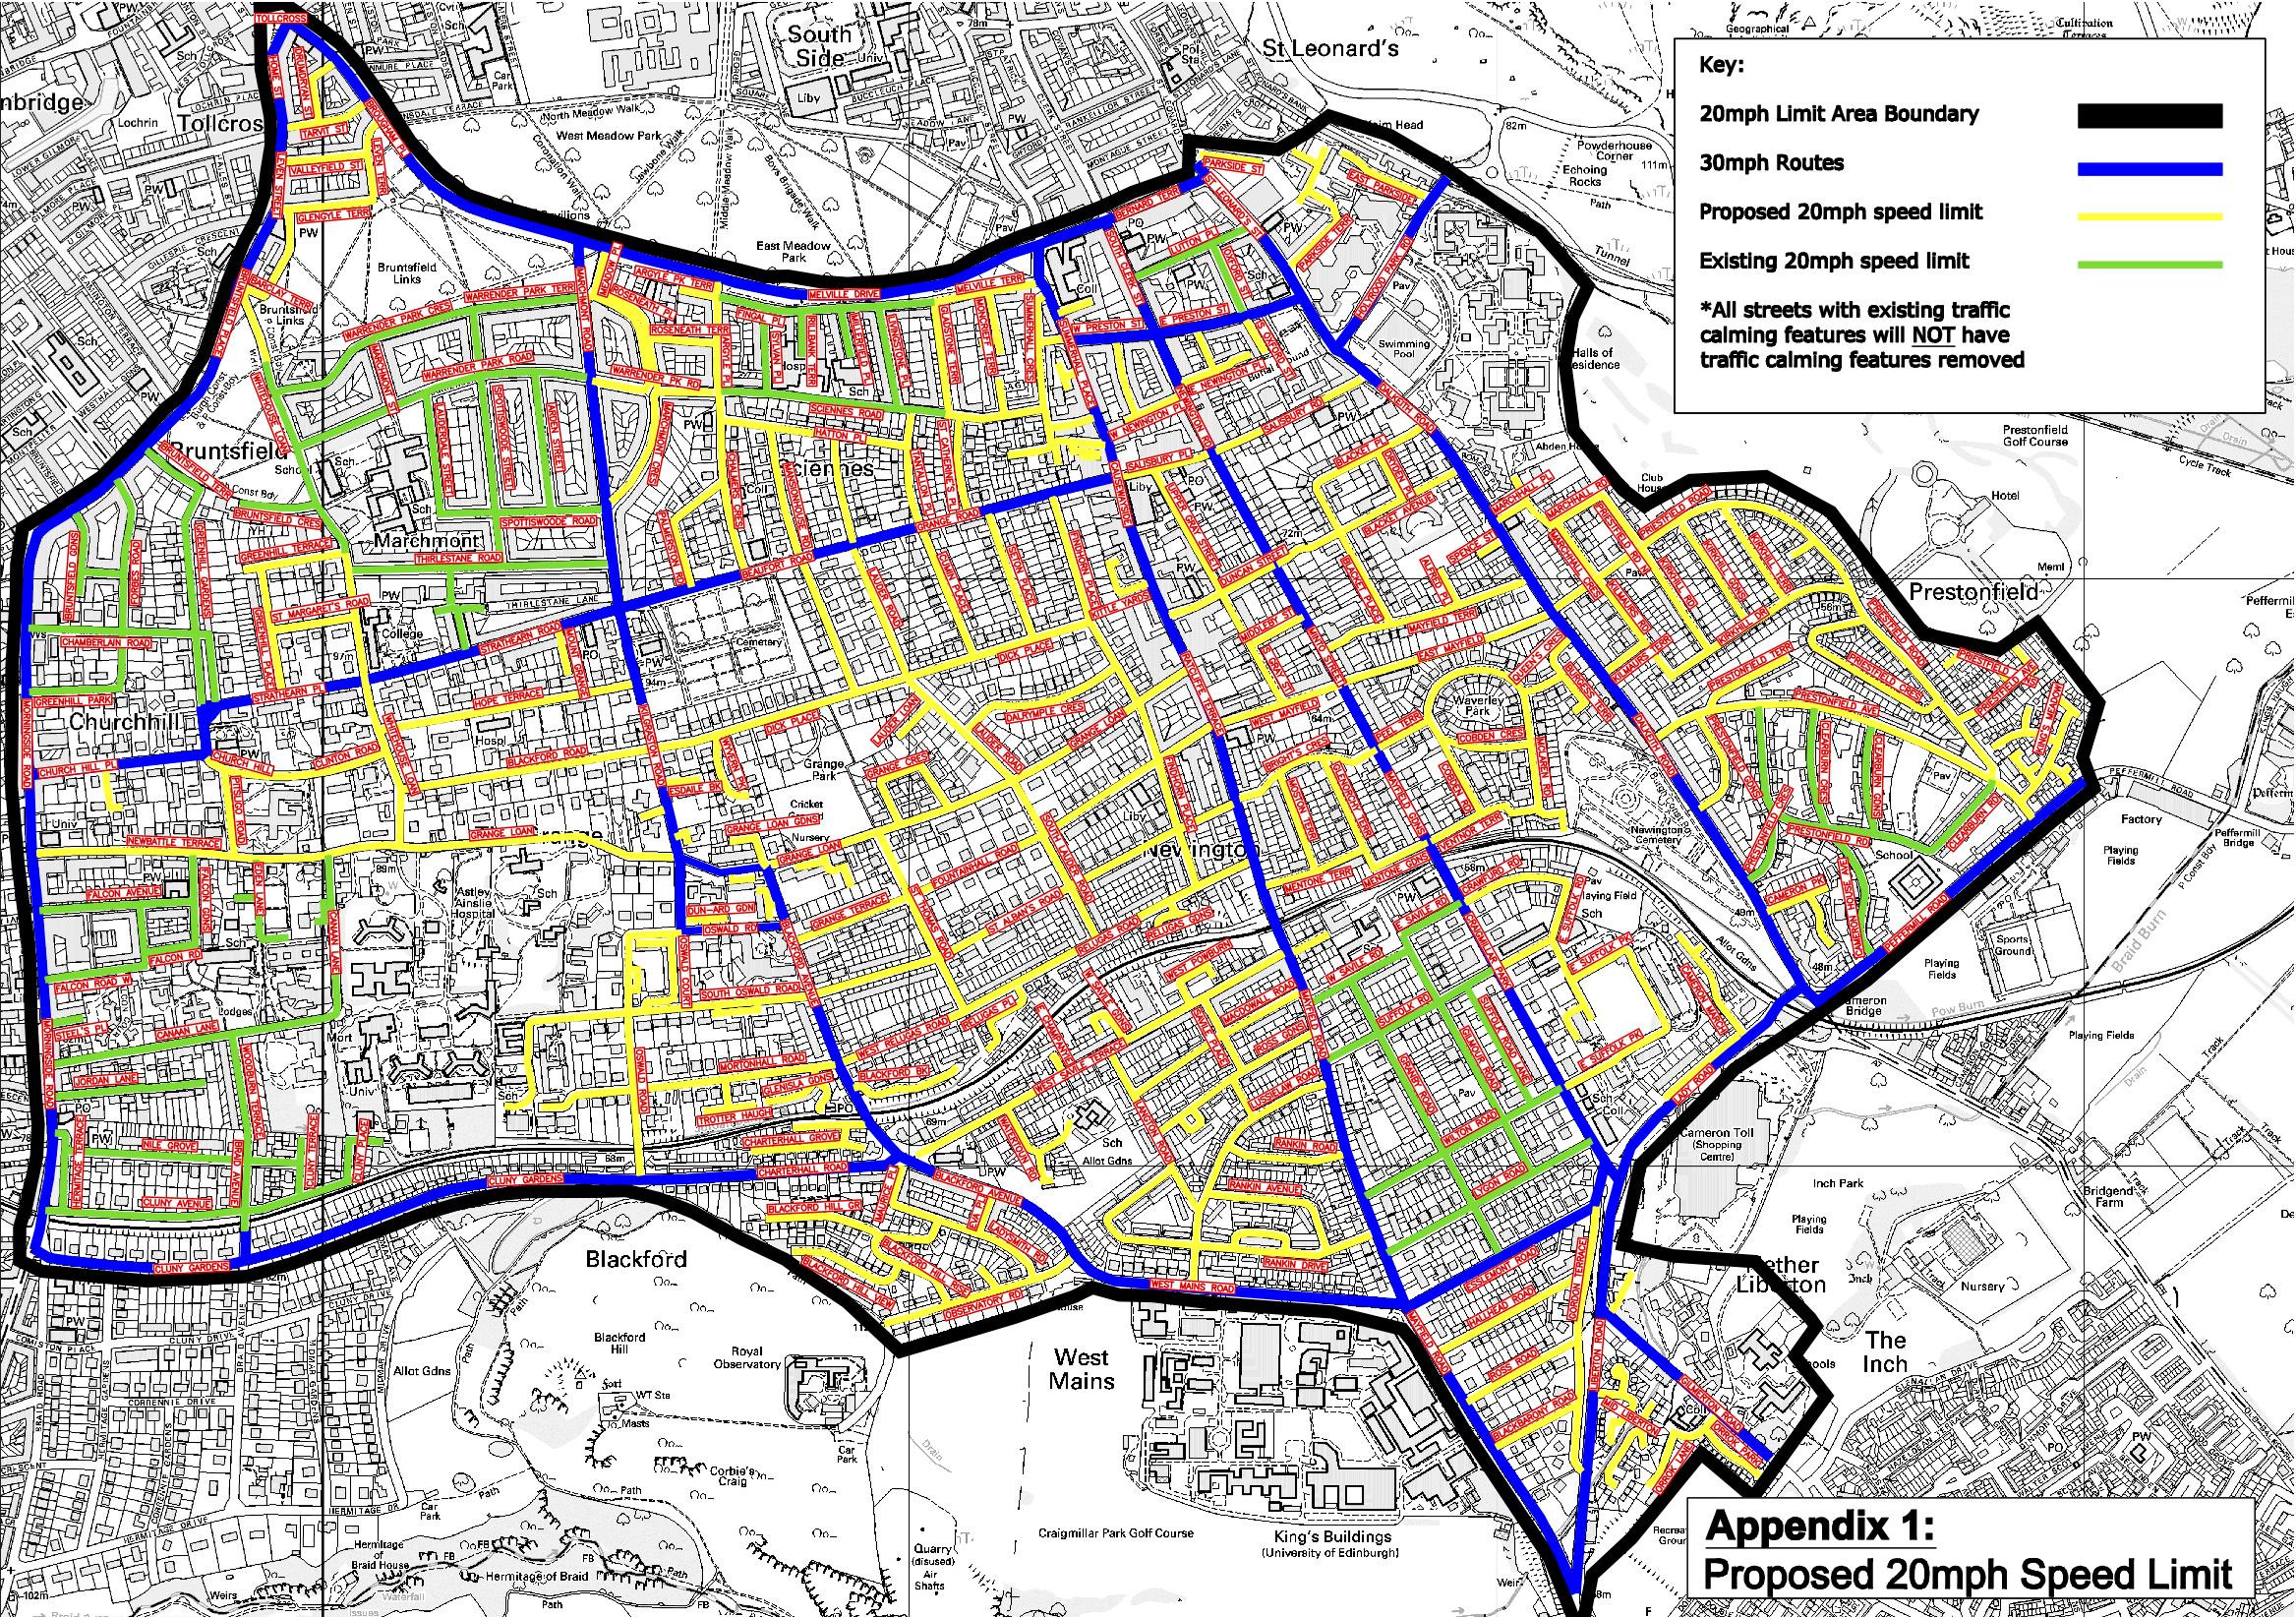 Edinburgh Parking Map Edinburgh | Pedestrian Liberation Edinburgh Parking Map